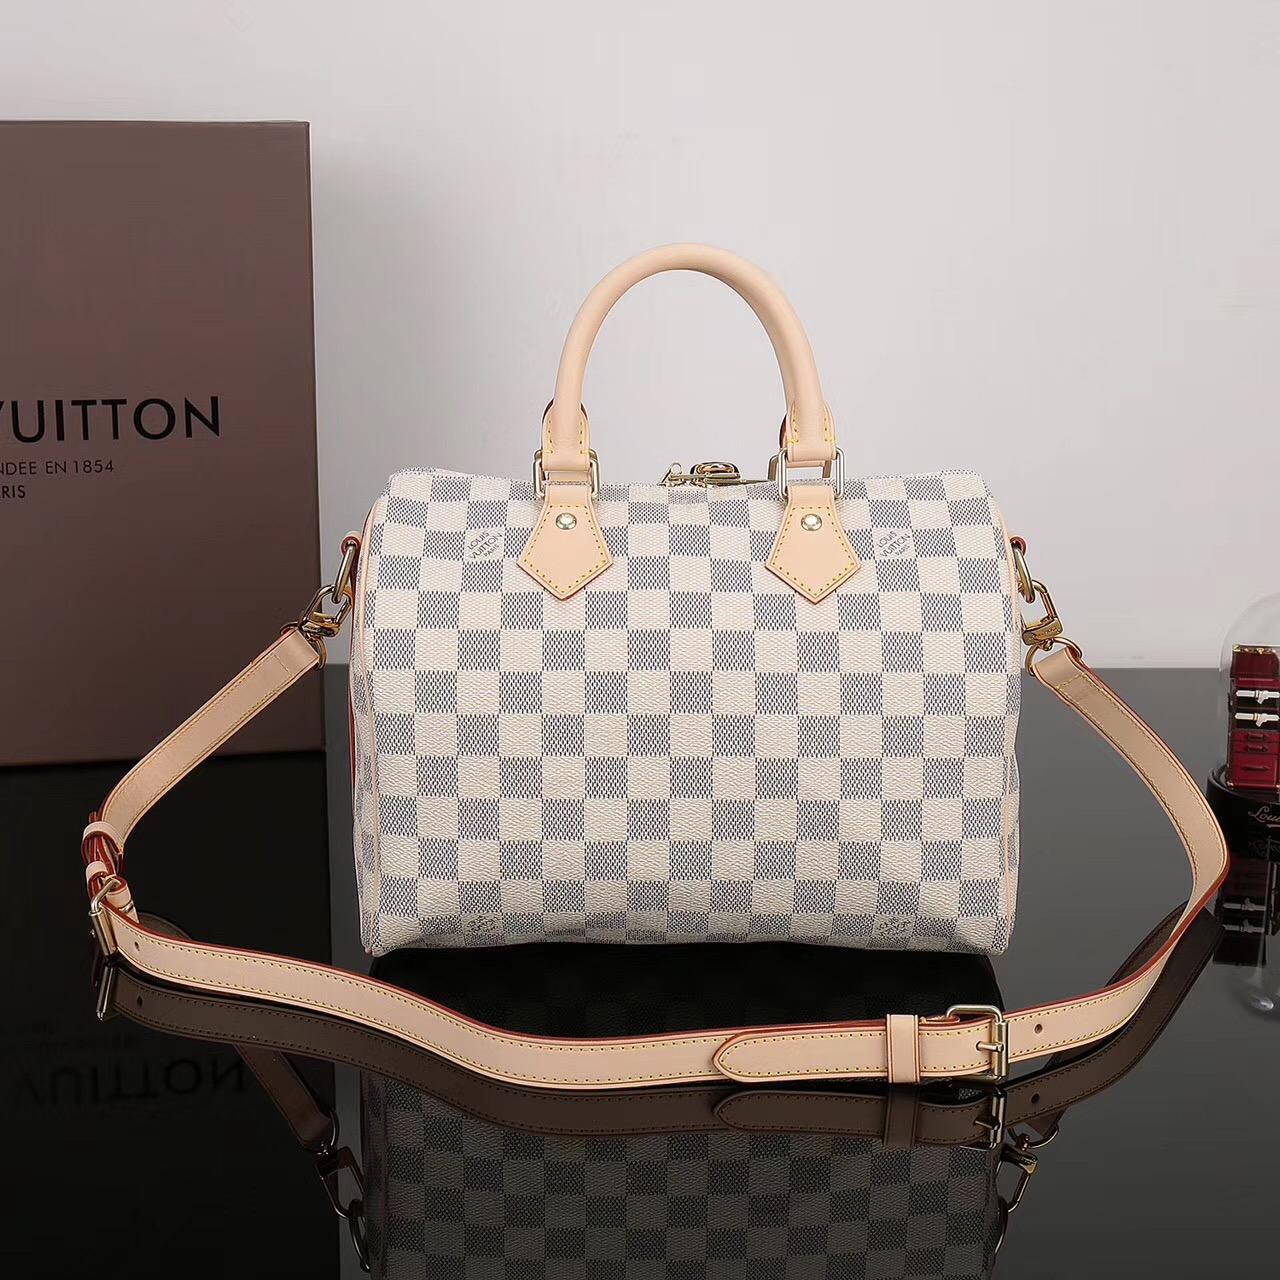 b905fec16850d LV Louis Vuitton Speedy 25 Damier bags N41374 Handbags White  LV1147 ...